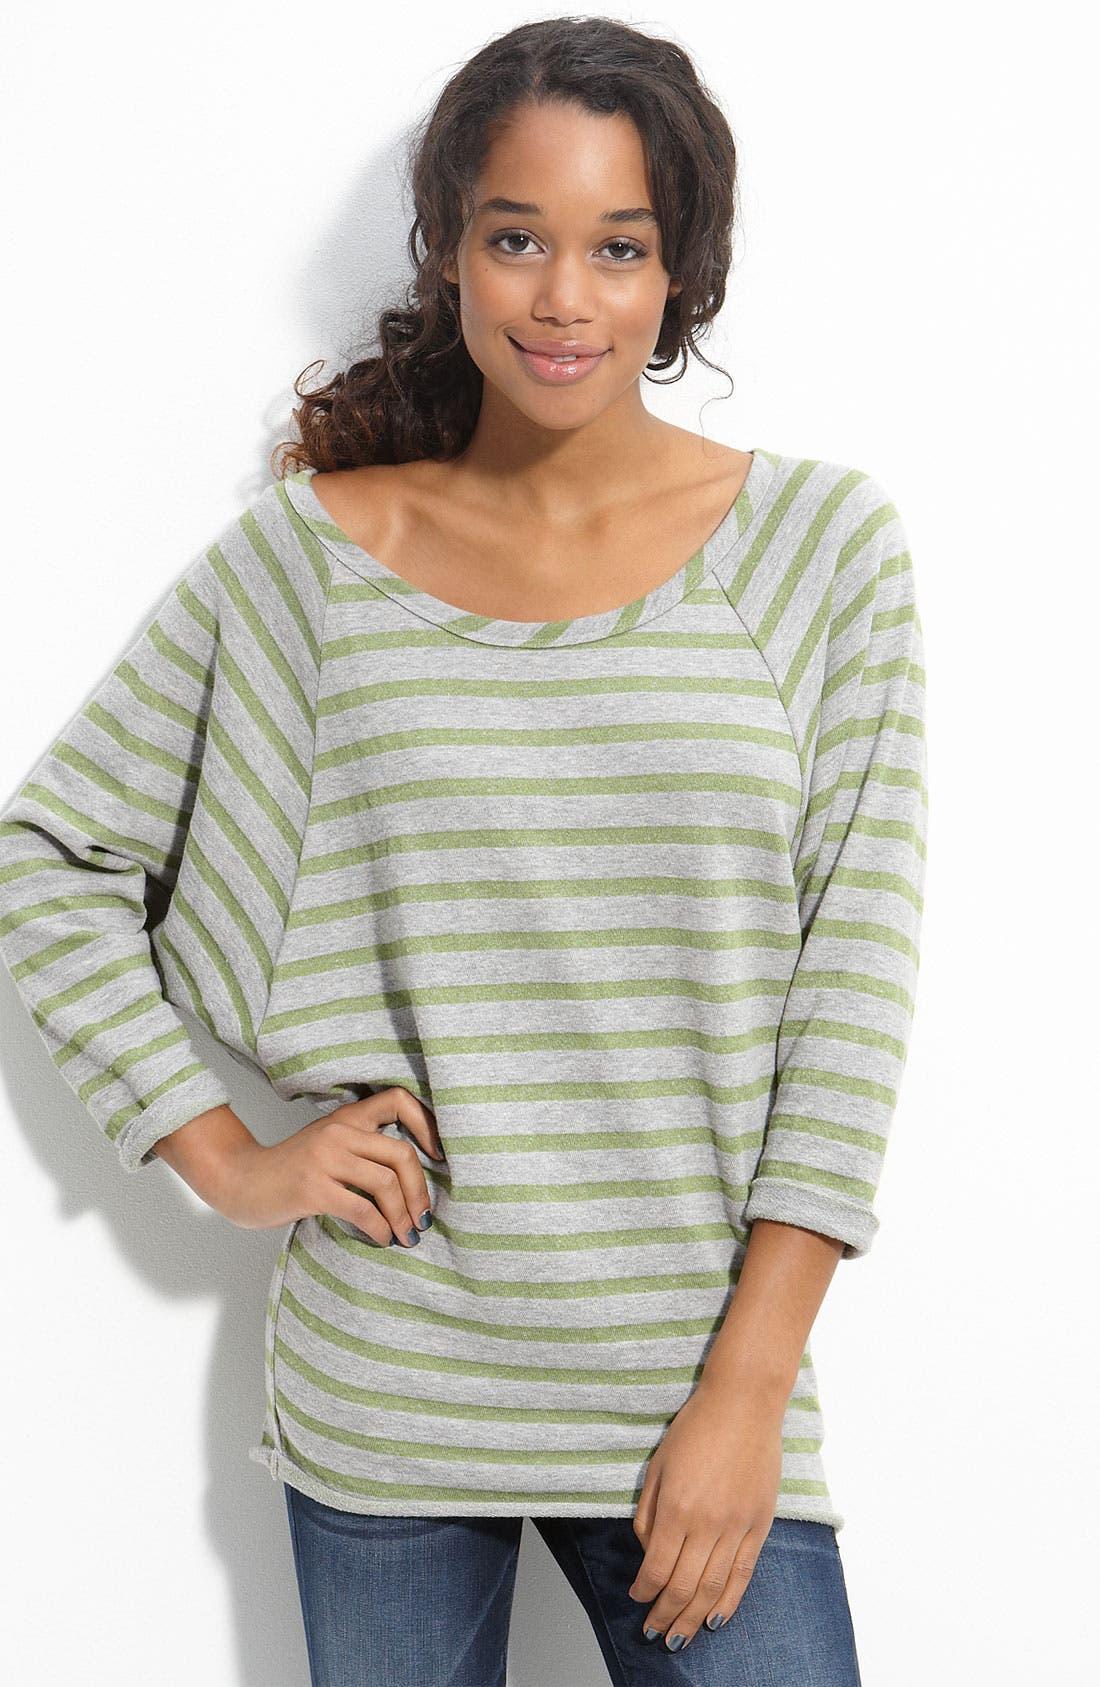 Alternate Image 1 Selected - h.i.p. Raglan Sleeve Fleece Top (Juniors)